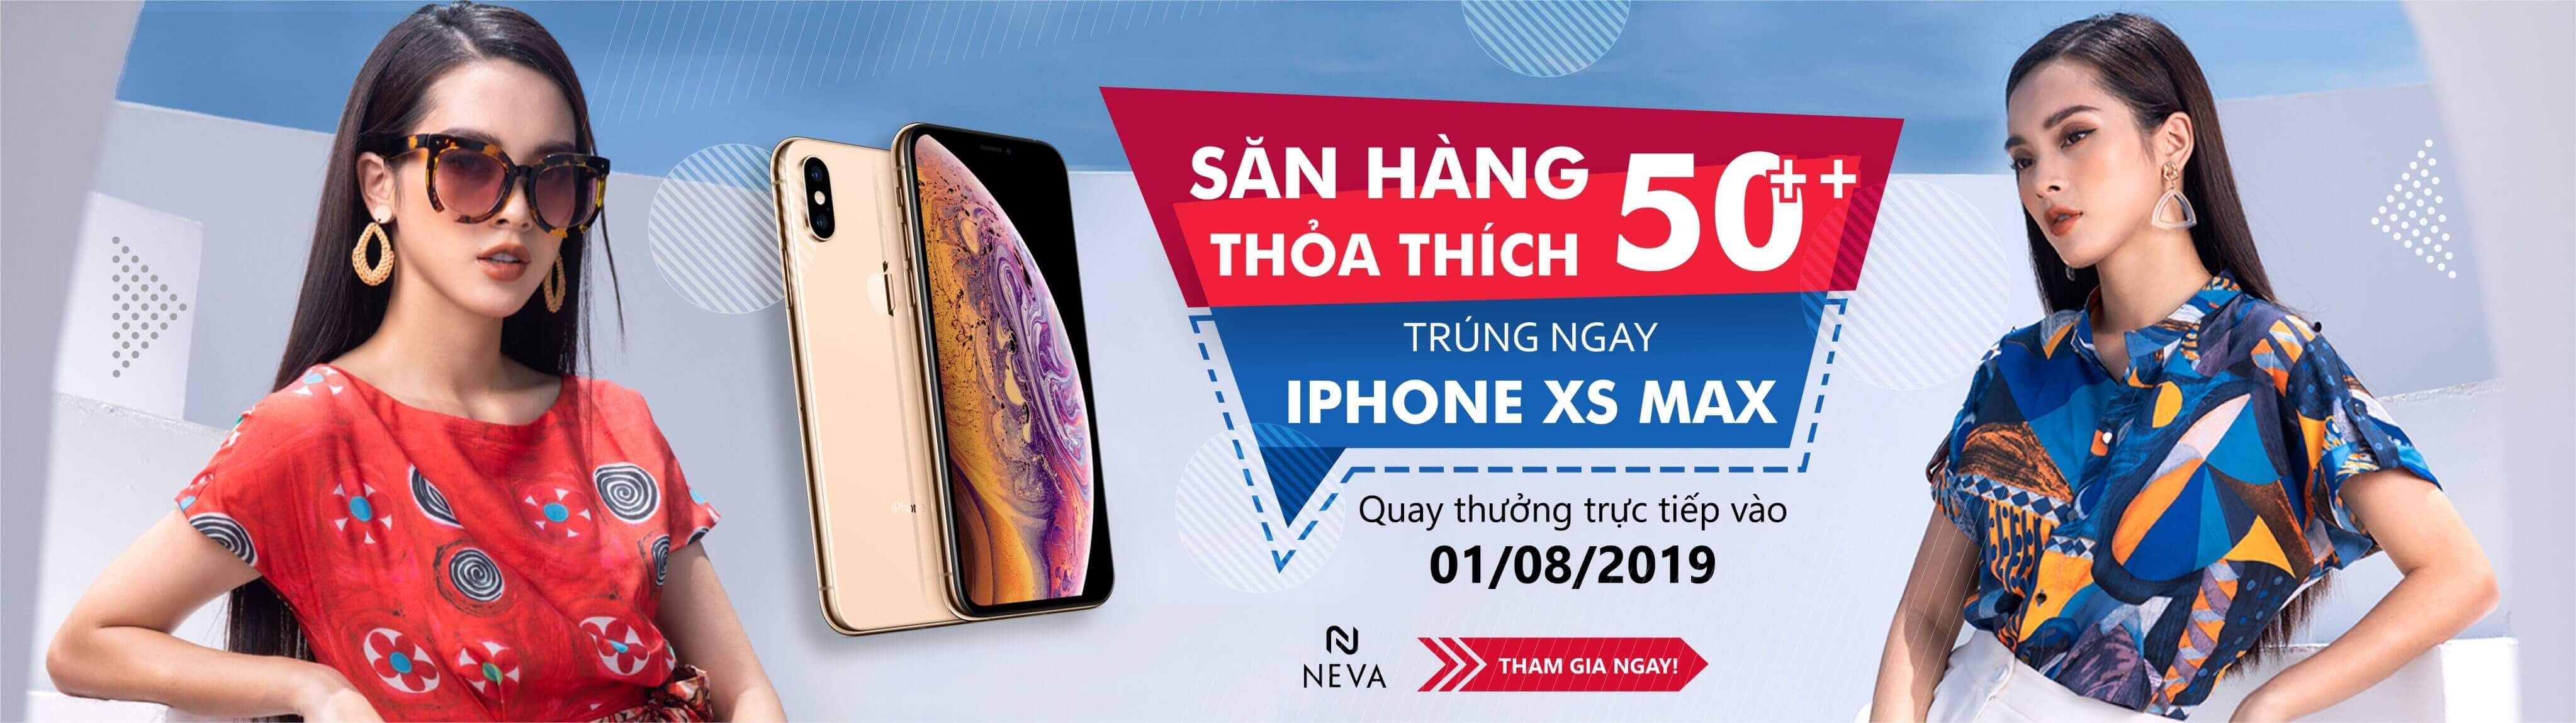 Khuyến mãi iphone XS Max